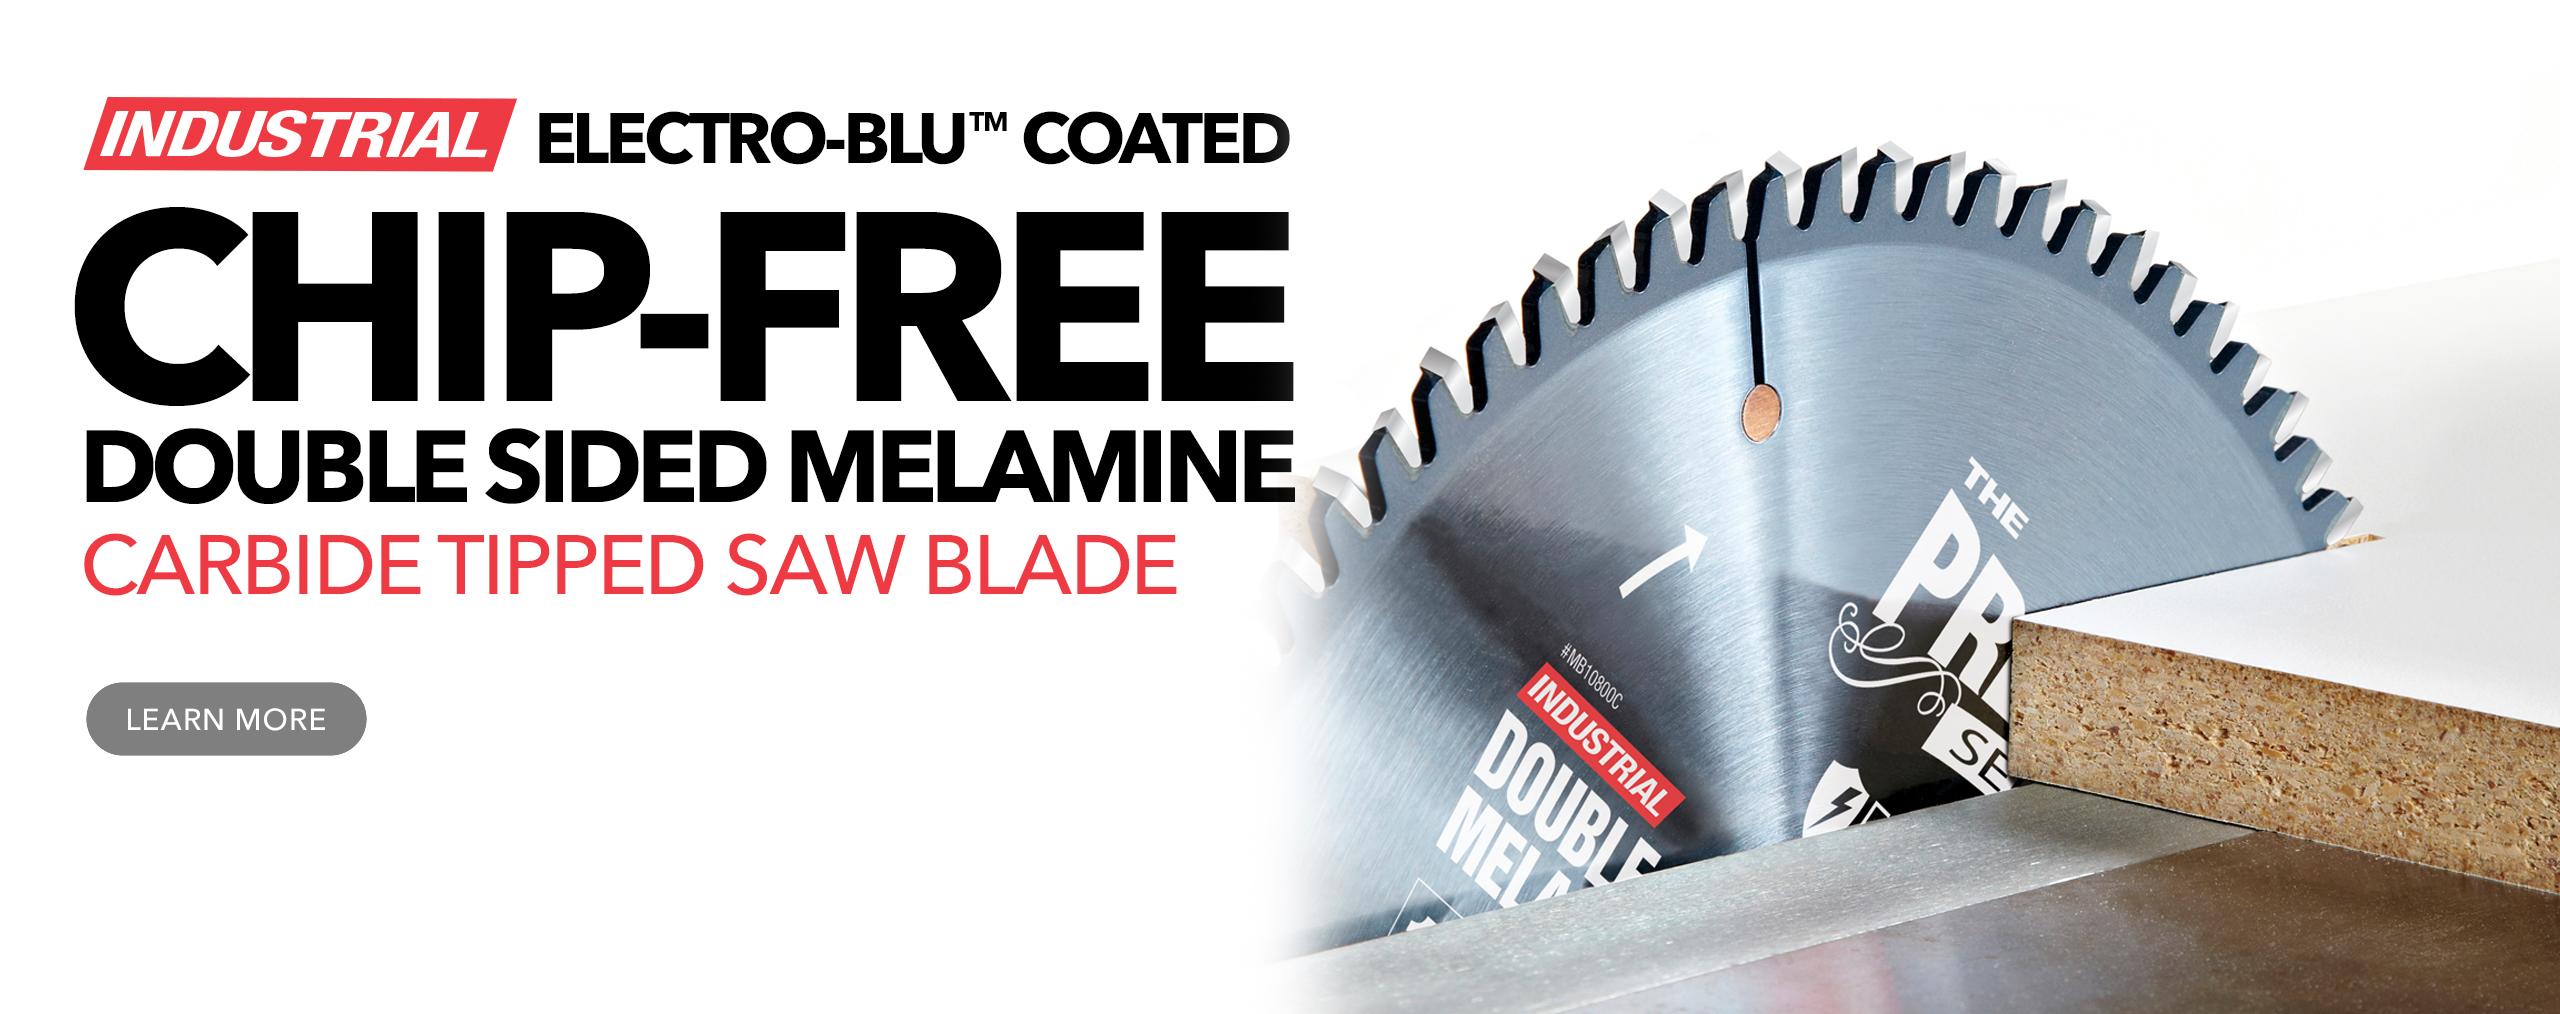 Melamine Saw Blades